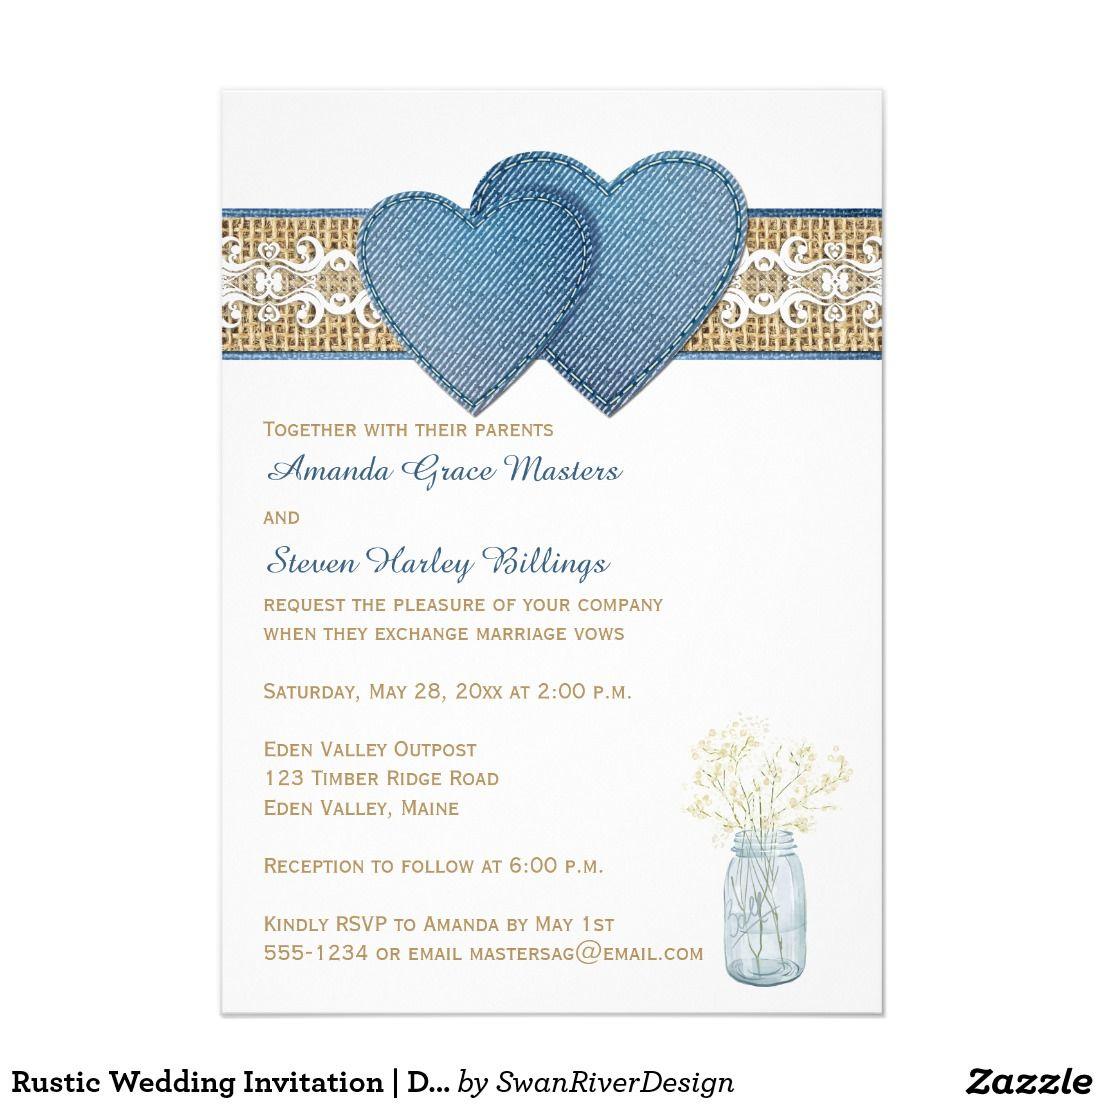 Rustic Wedding Invitation   Denim, Lace, Burlap   Country wedding ...